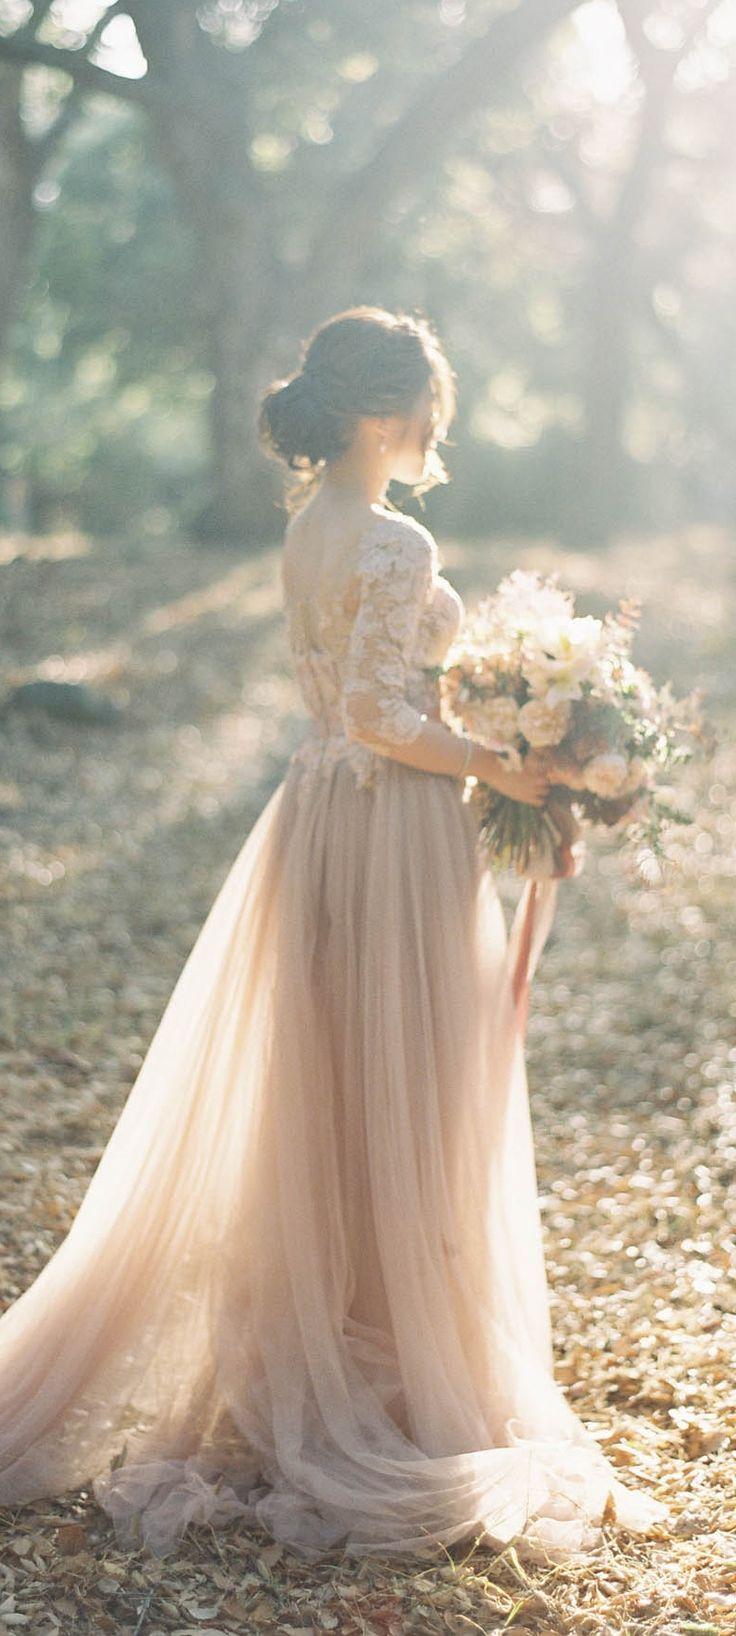 Cream colored vintage wedding dresses  This beige wedding dress is magical  Wedding  Pinterest  Beige